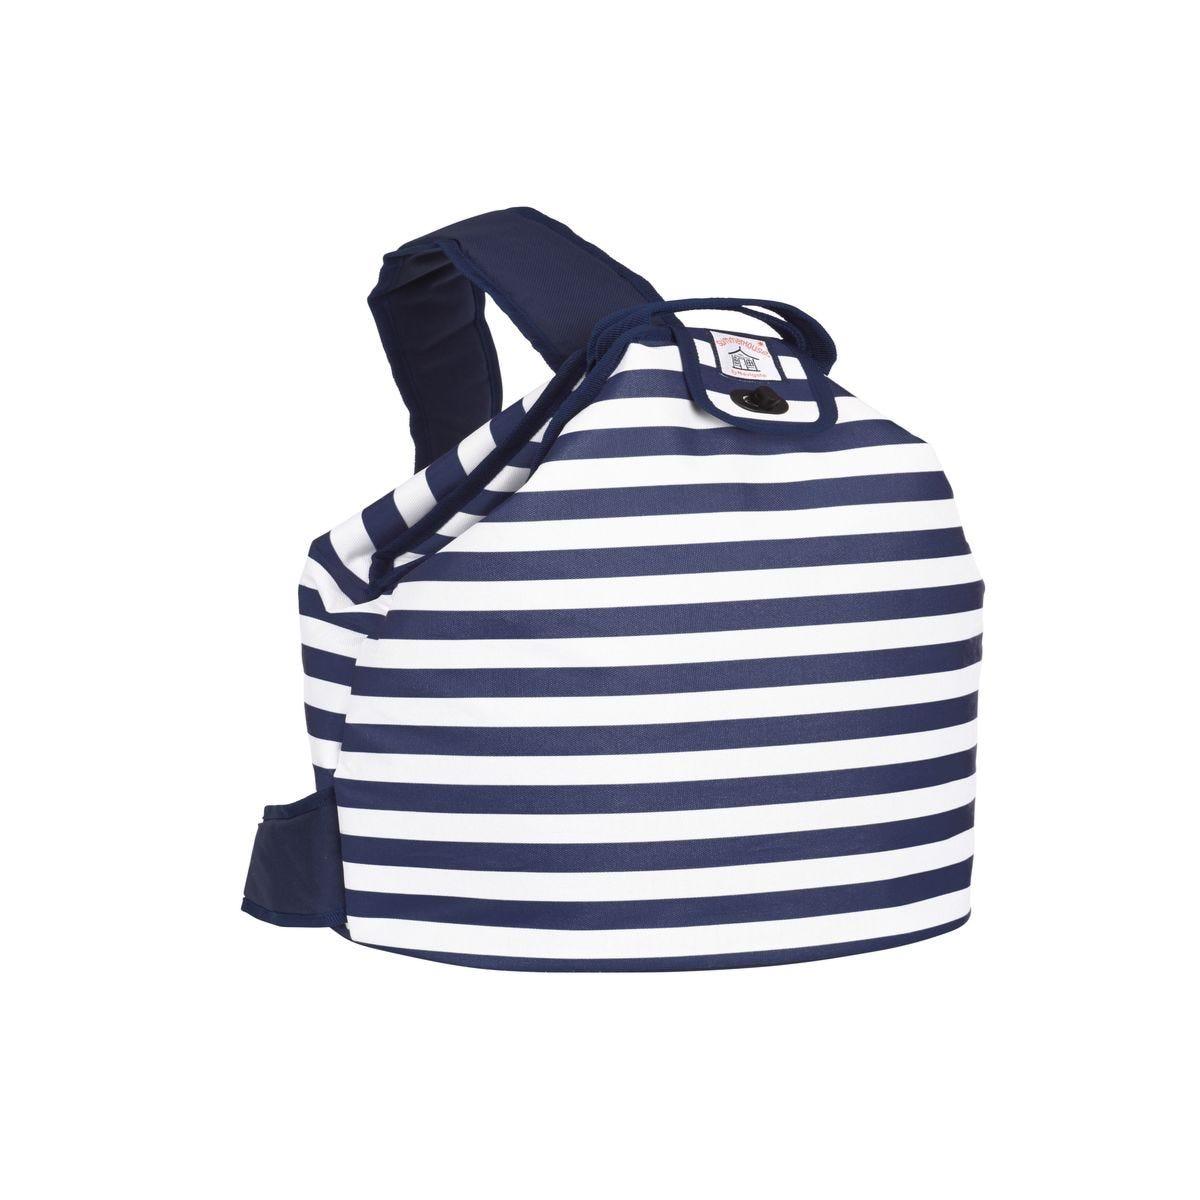 Summerhouse Coast Stripe 20L Duffle Bag - Navy & White